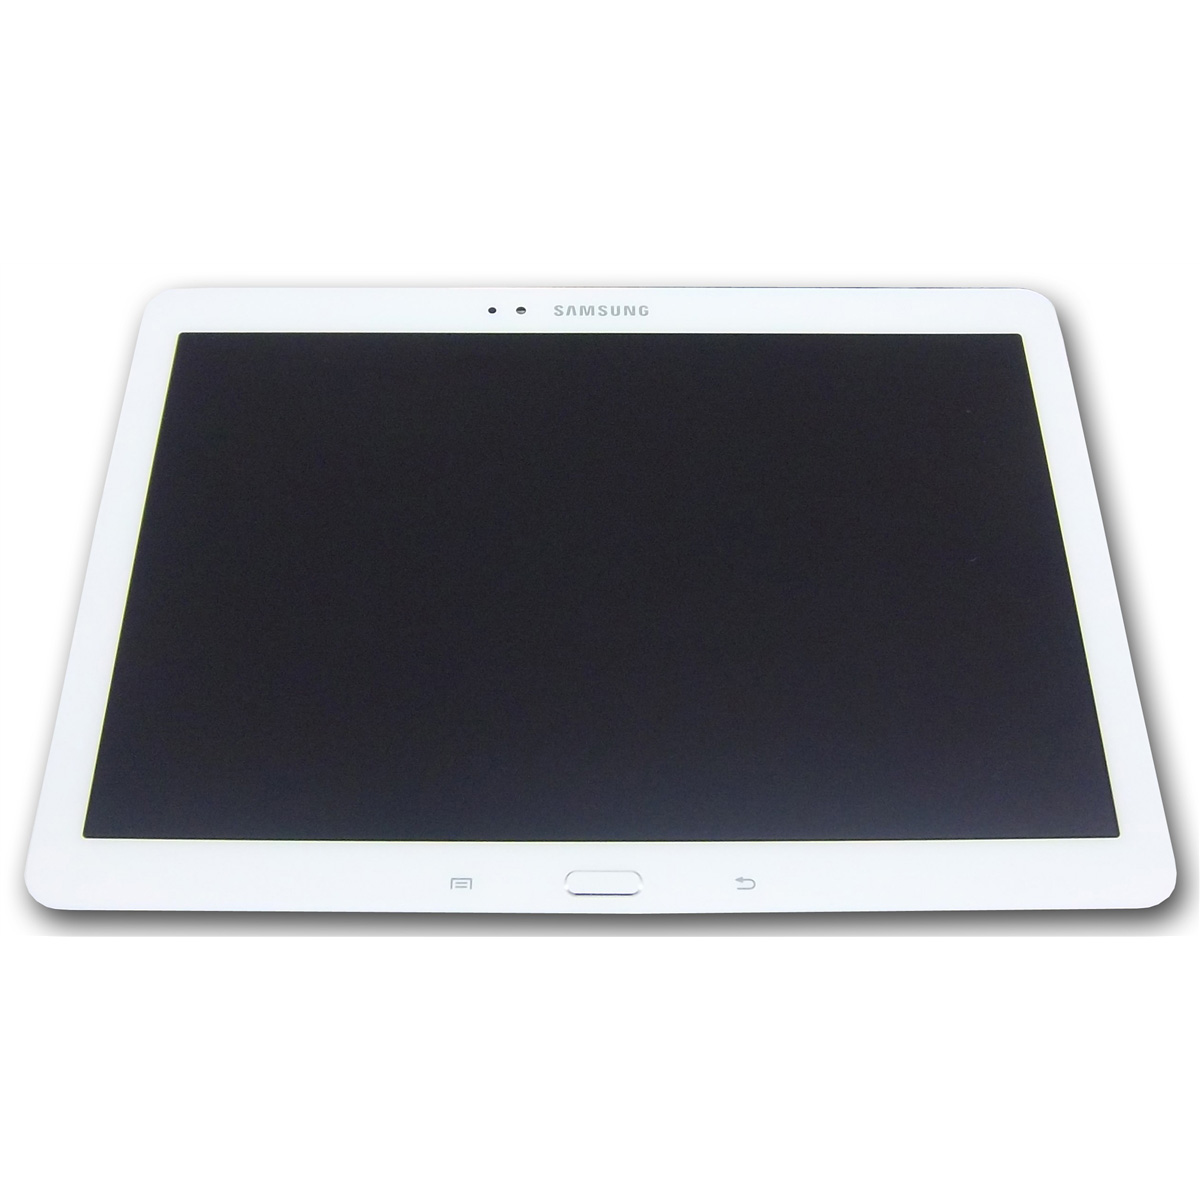 Ansamblu LCD Display Touchscreen Samsung P605 Galaxy Note 10.1 2014 LTE Alb imagine powerlaptop.ro 2021